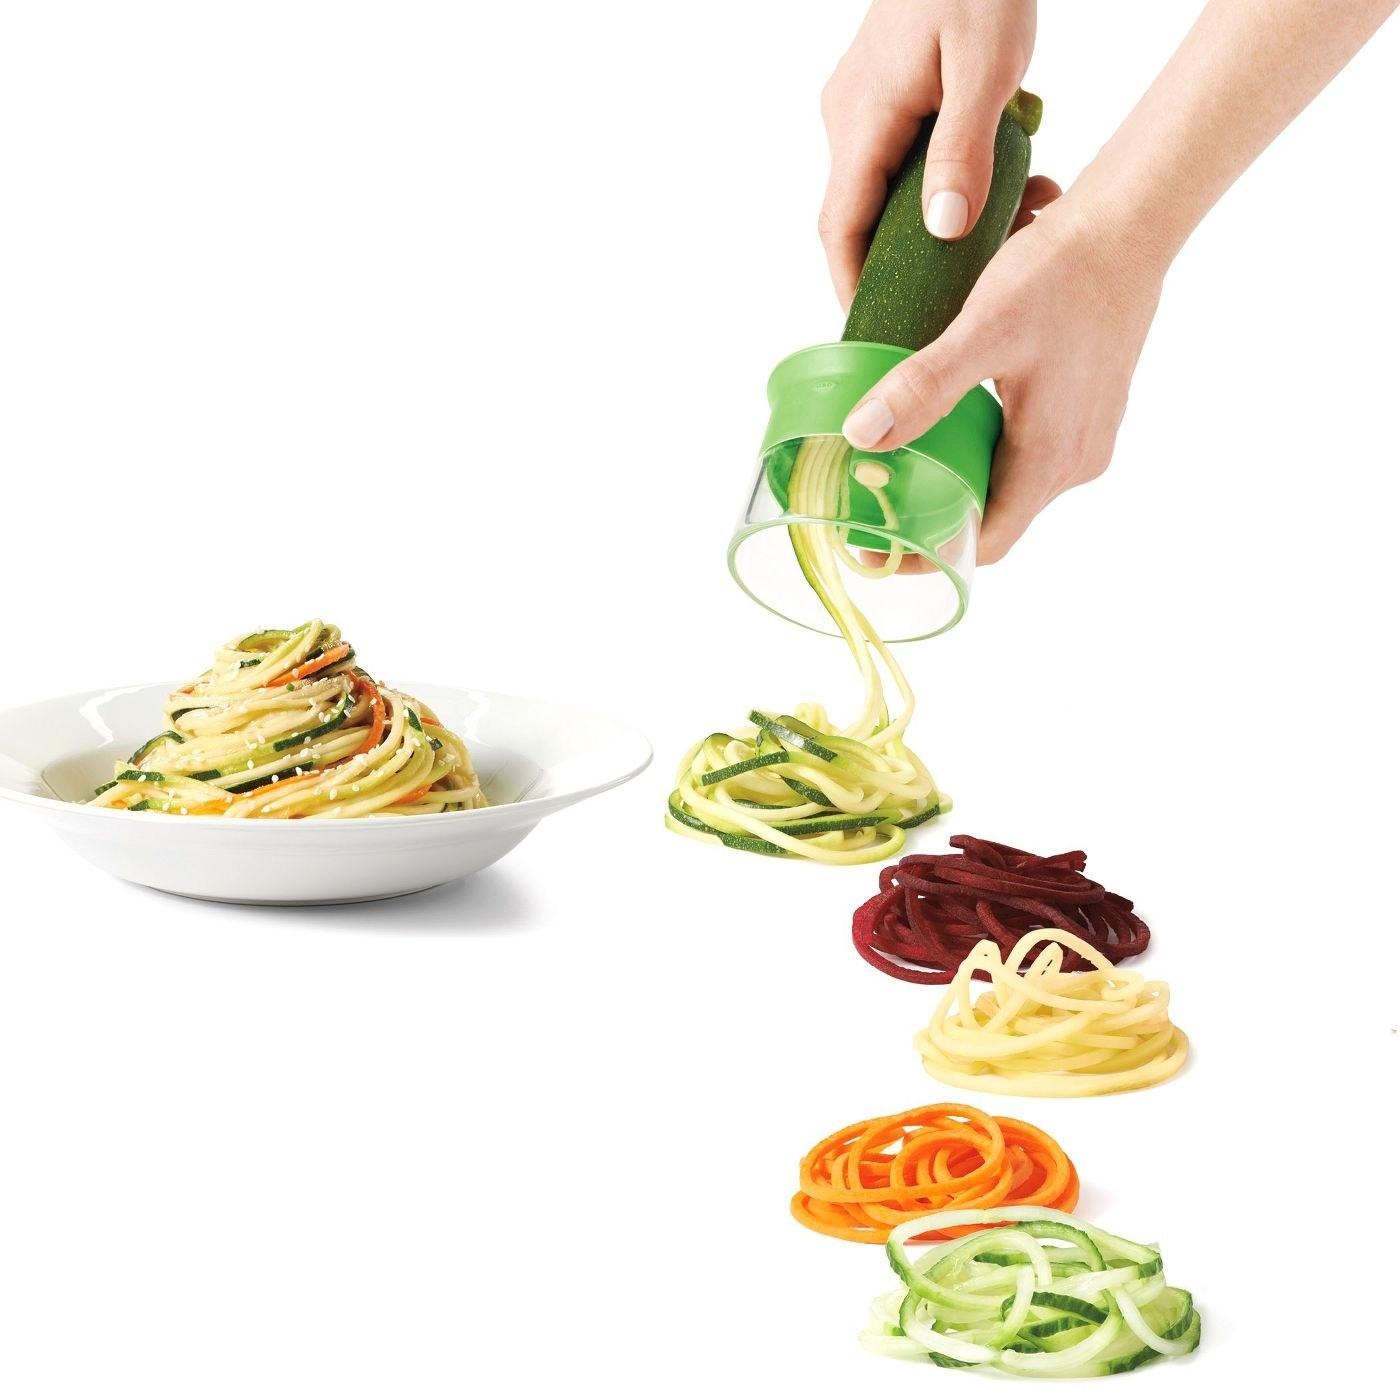 Hands using the spiralizer to make veggie noodles